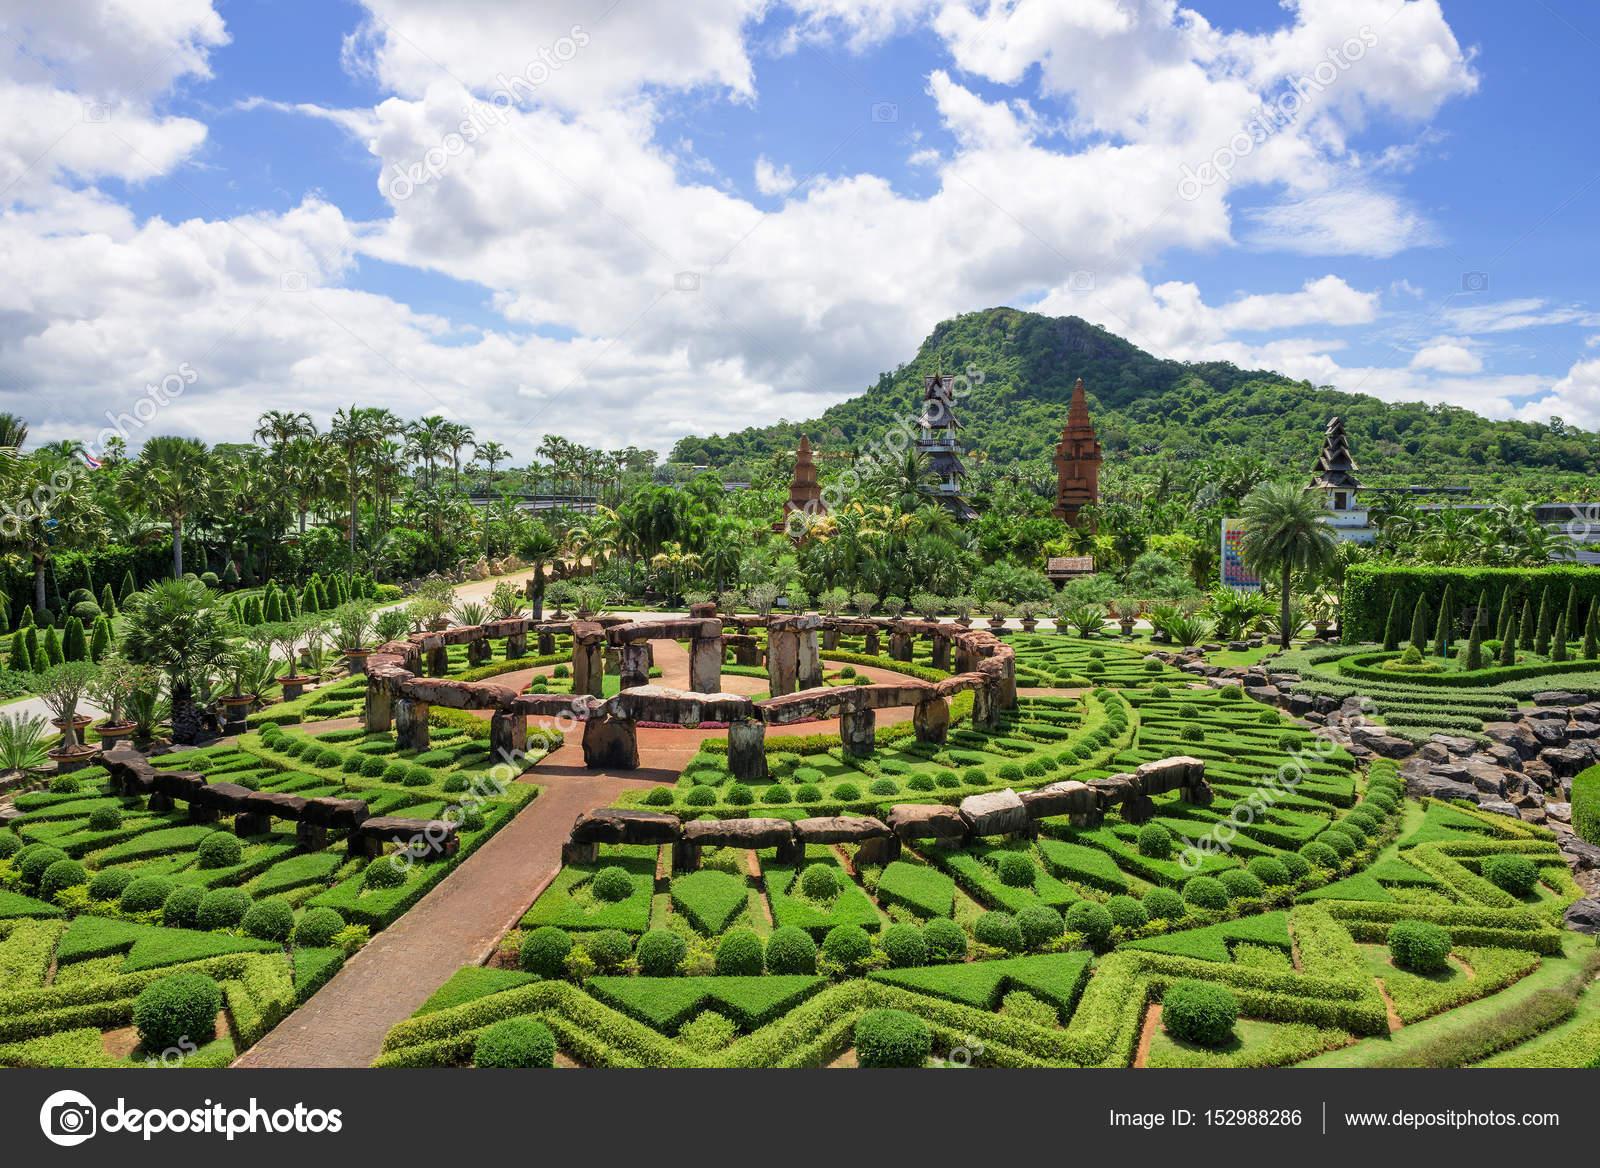 CHONBURI, THAILAND - AUGUST 08, 2015: Beautiful garden decoration in Nong Nooch Tropical Botanical Garden. Nong Nooch Tropical Botanical Garden is a ...